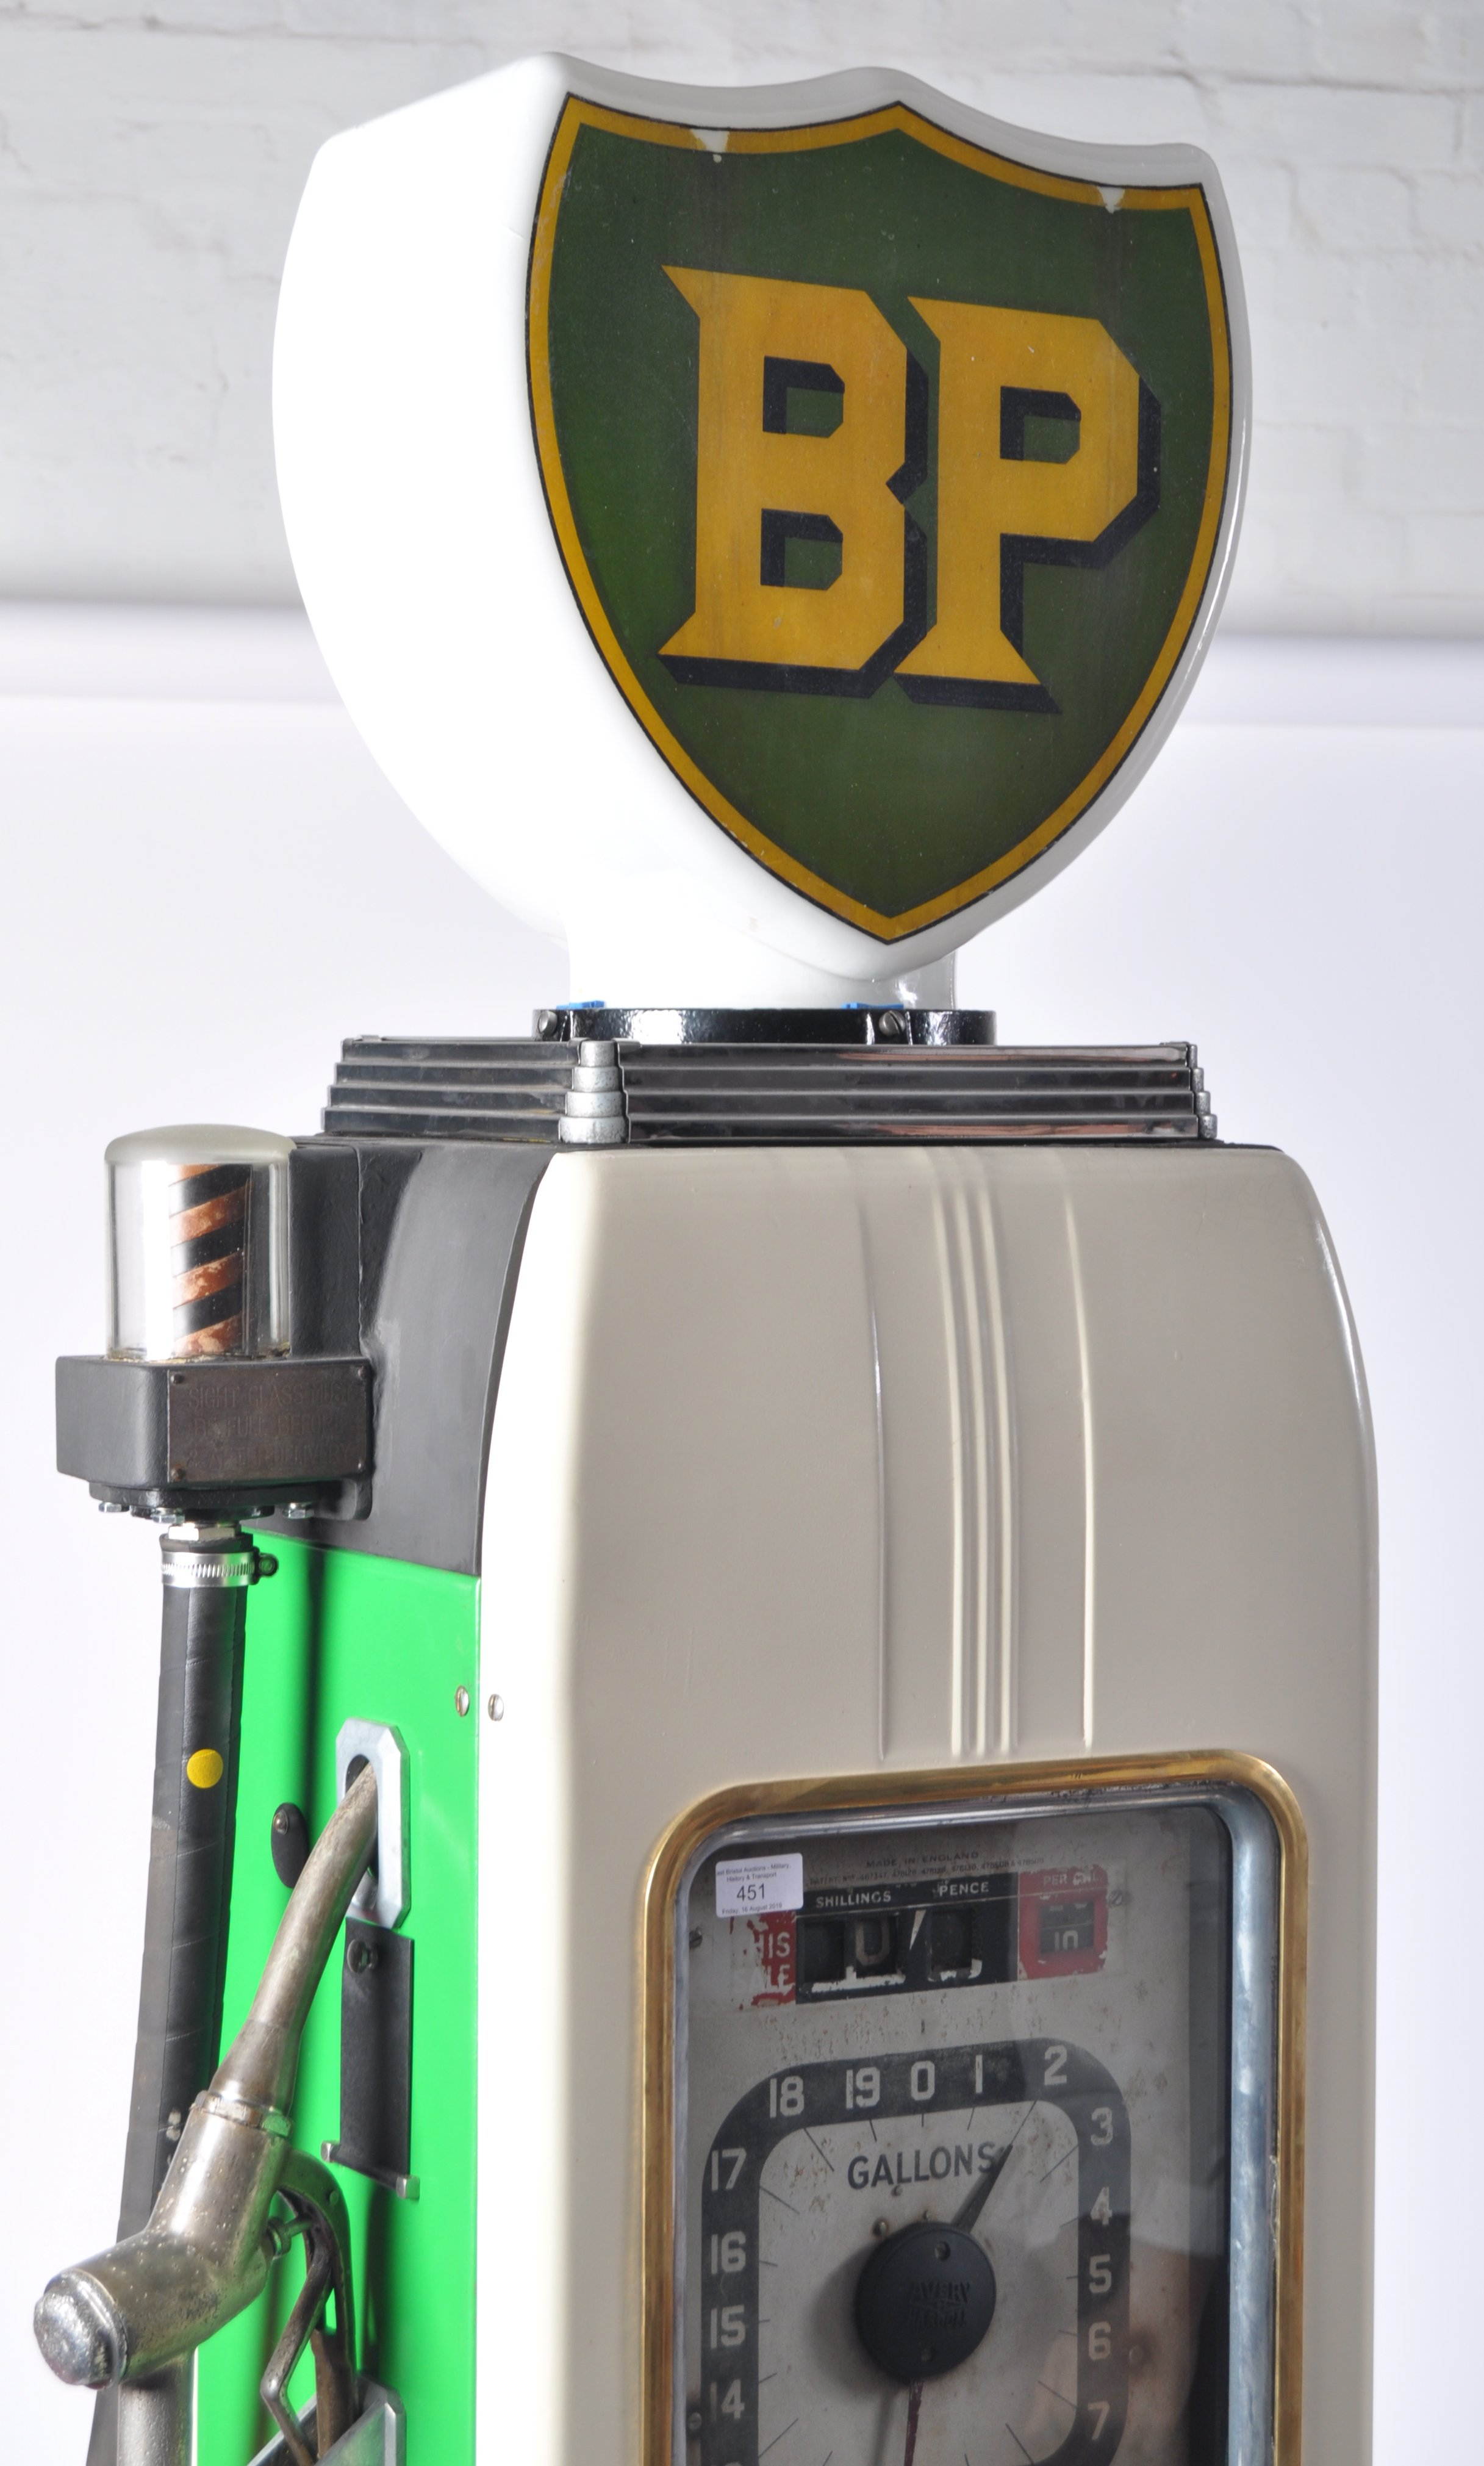 Lot 451 - RARE VINTAGE 1950'S ' BP ' BRITISH PETROLEUM PETROL PUMP